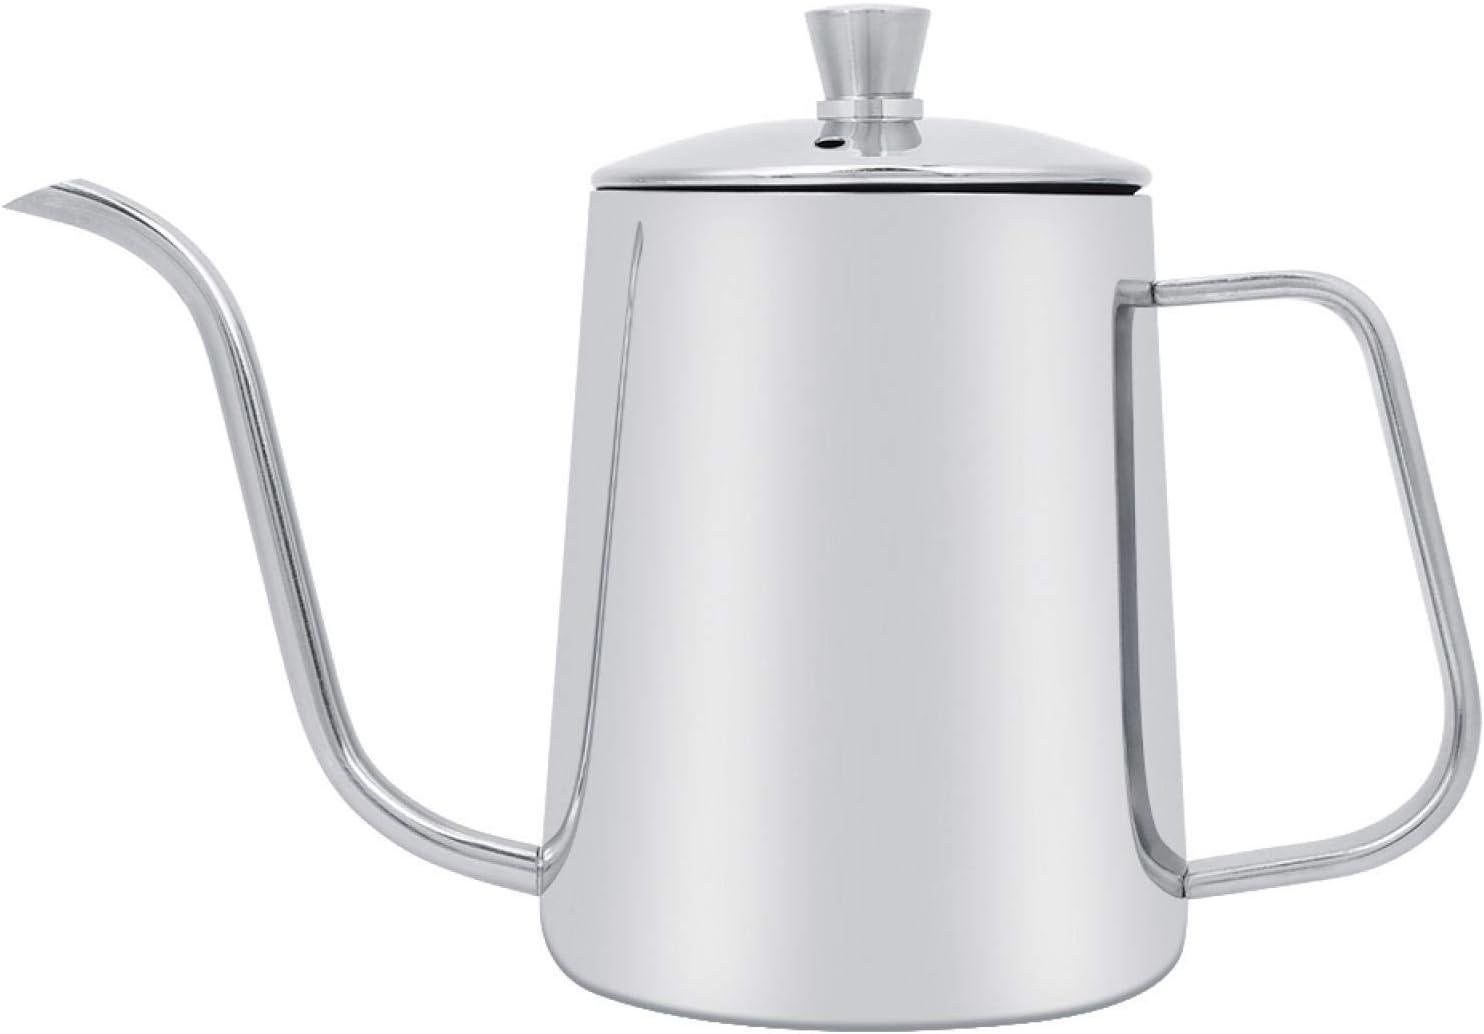 550ml Max 47% OFF Stainless Steel Coffee Kettle Spout Gooseneck Long Overseas parallel import regular item Narrow